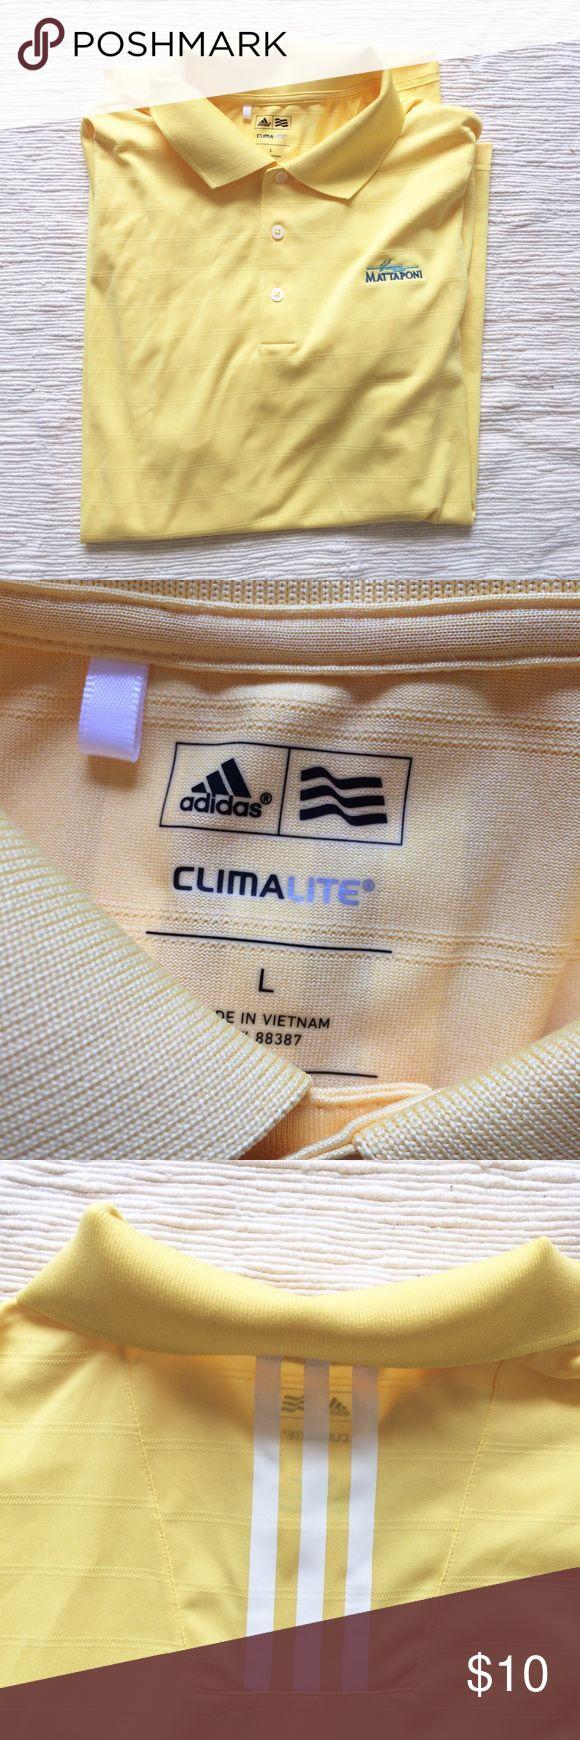 adidas climalite shirt 88387